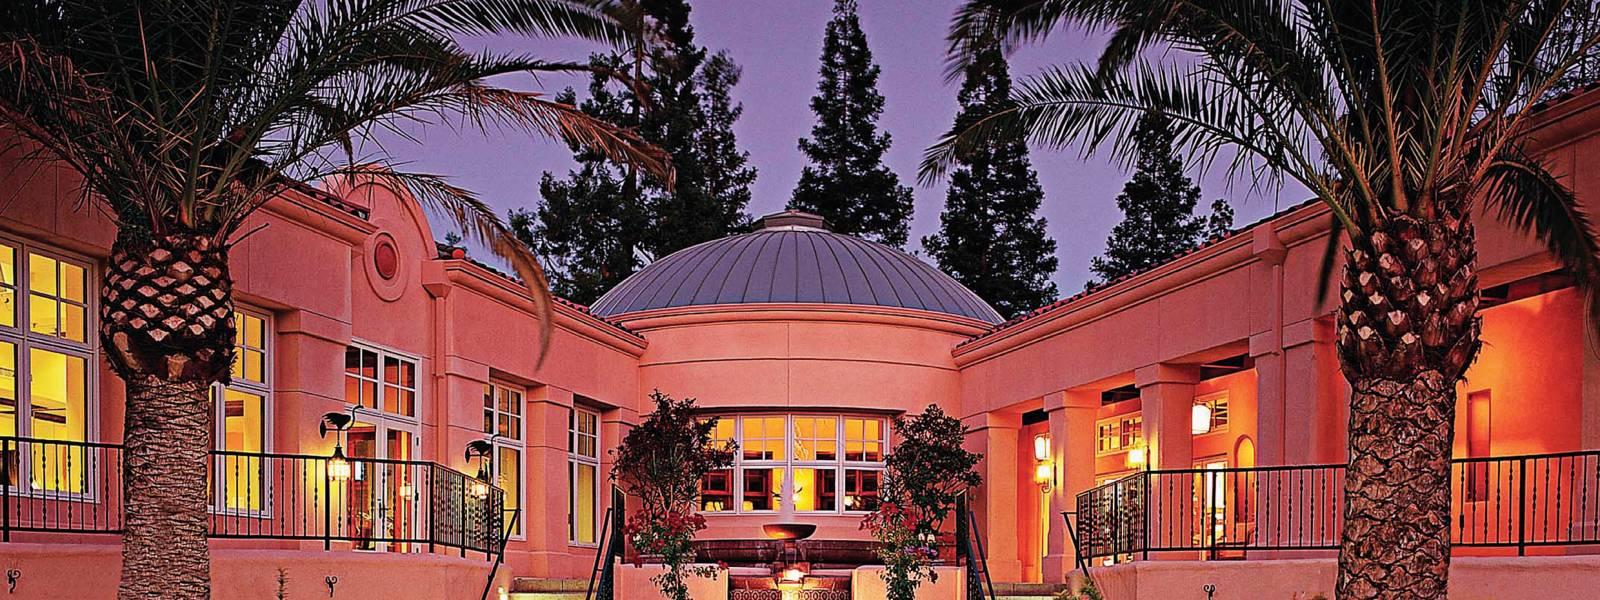 The Fairmont Sonoma Mission Inn & Spa